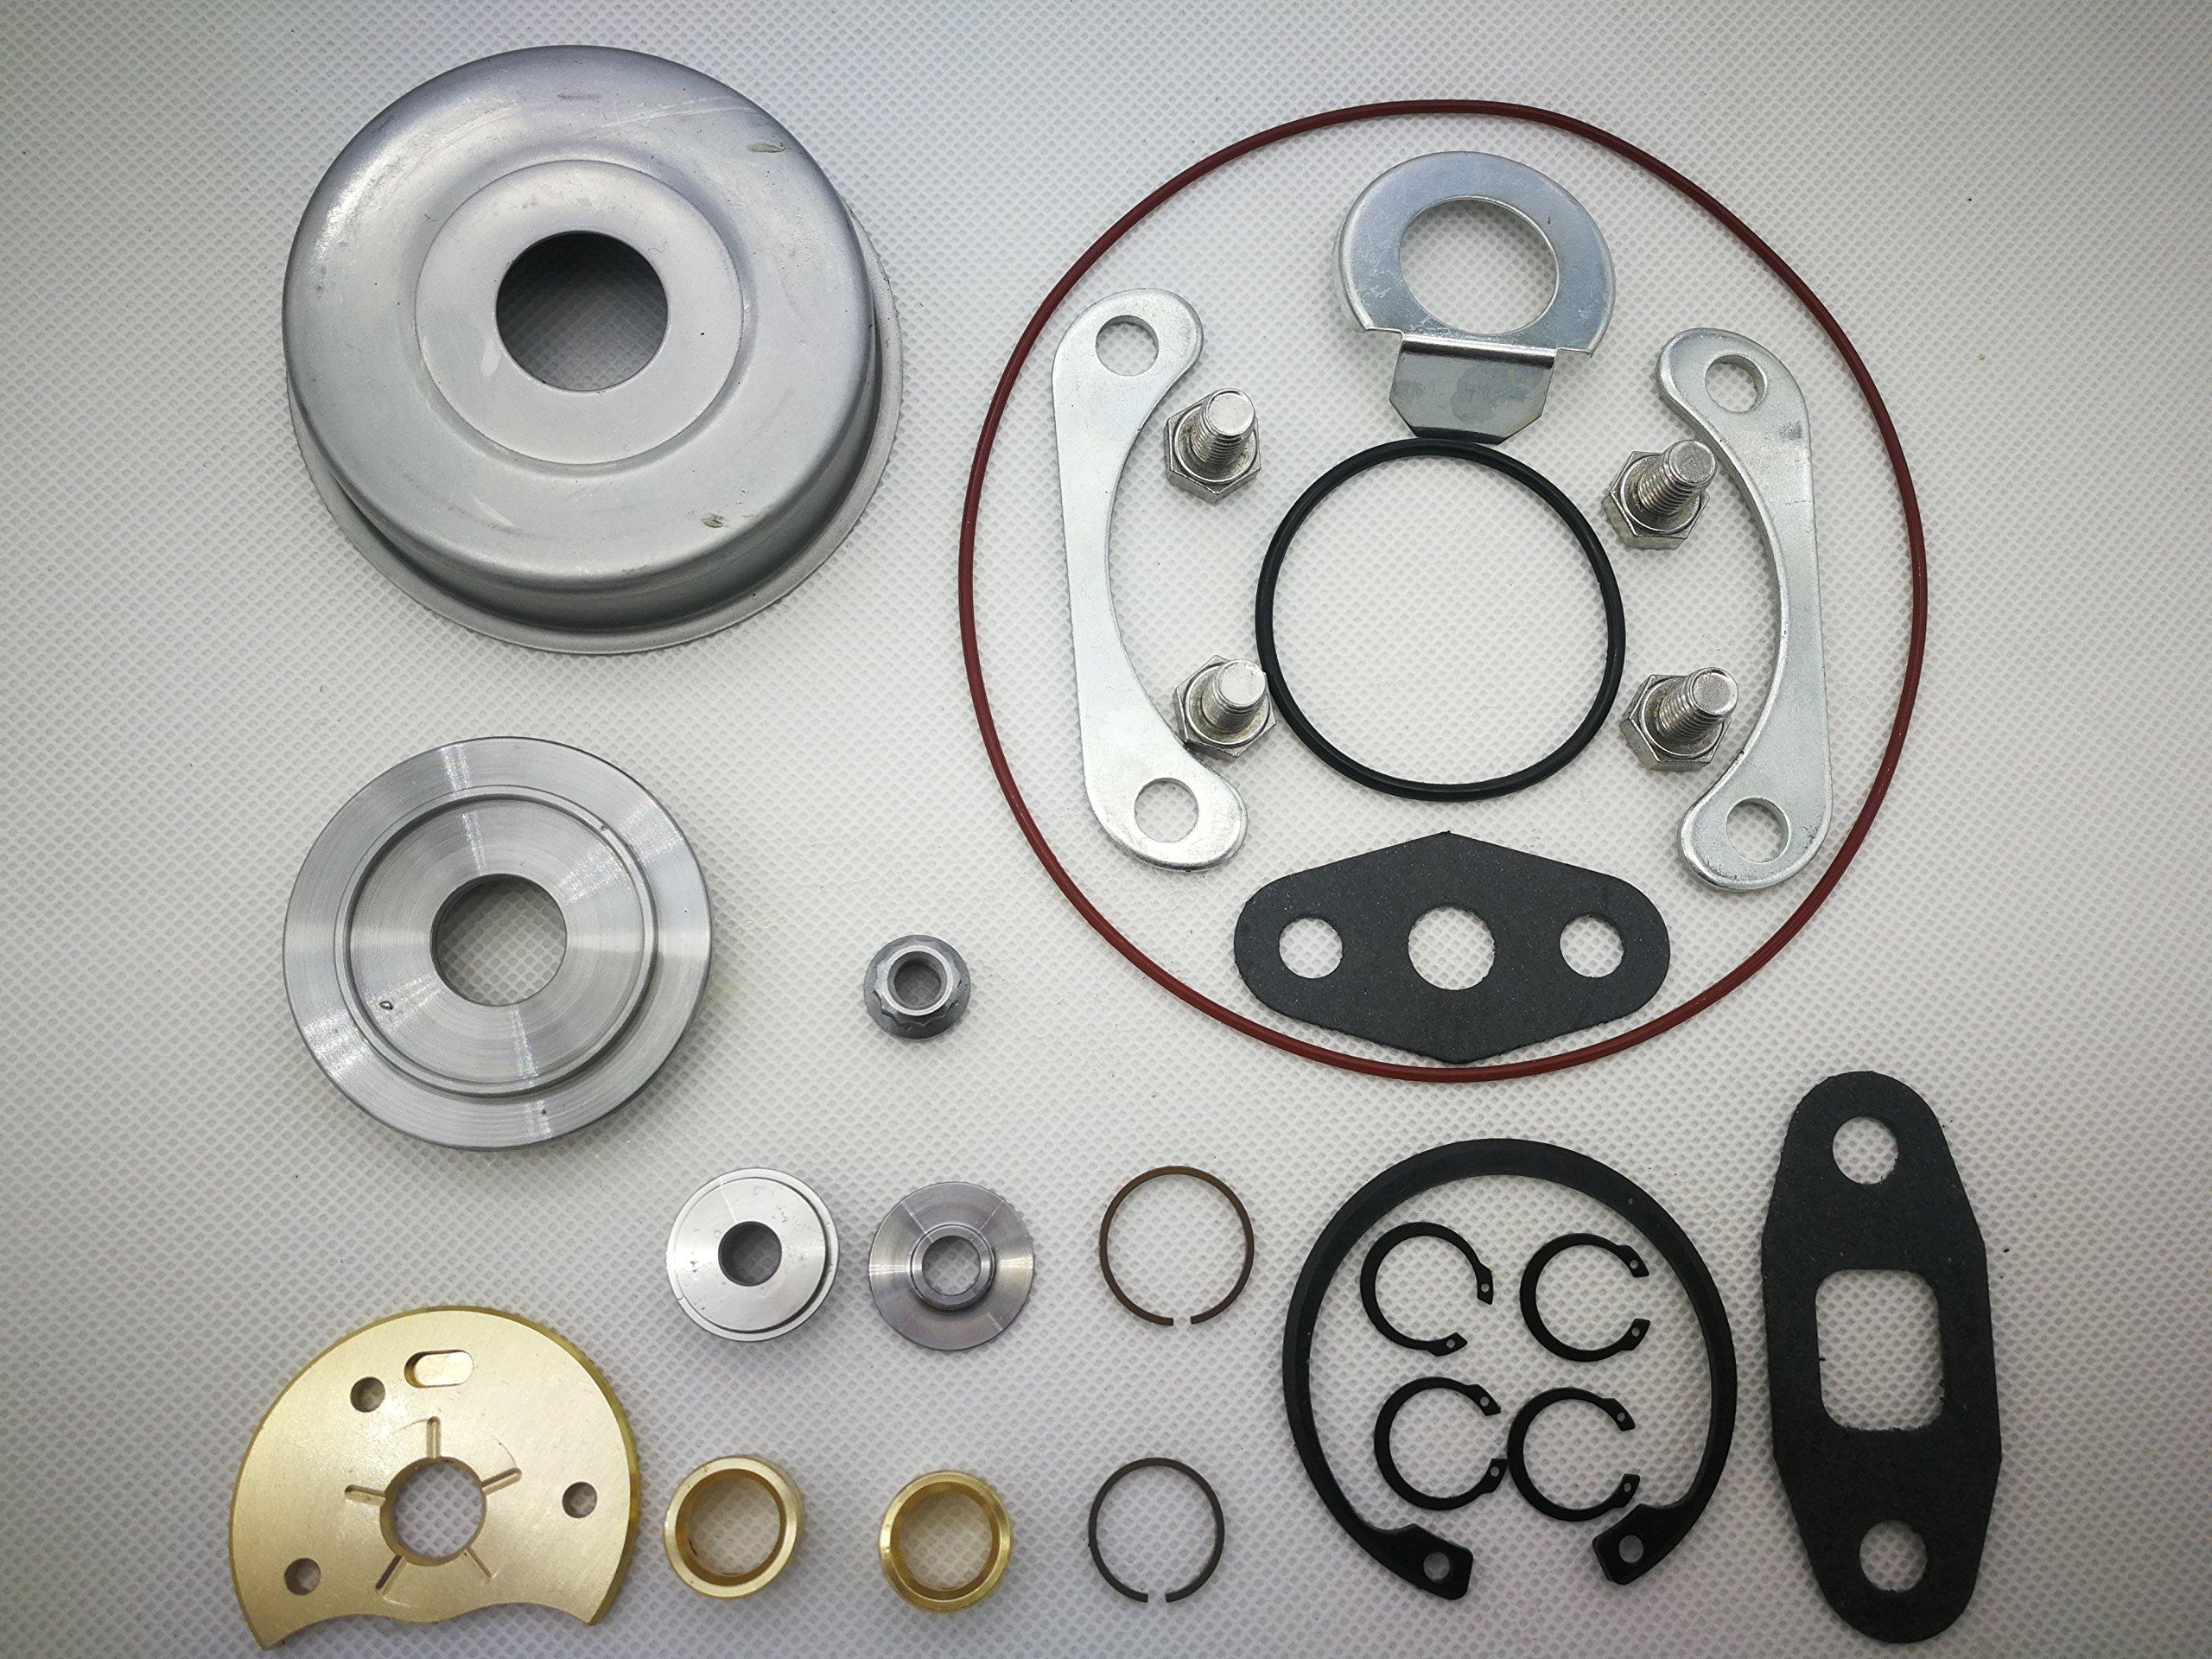 CW Cummins Turbo Turbocharger Rebuild Kit for Holset HX35 HX35W HY35 HX40 HE351